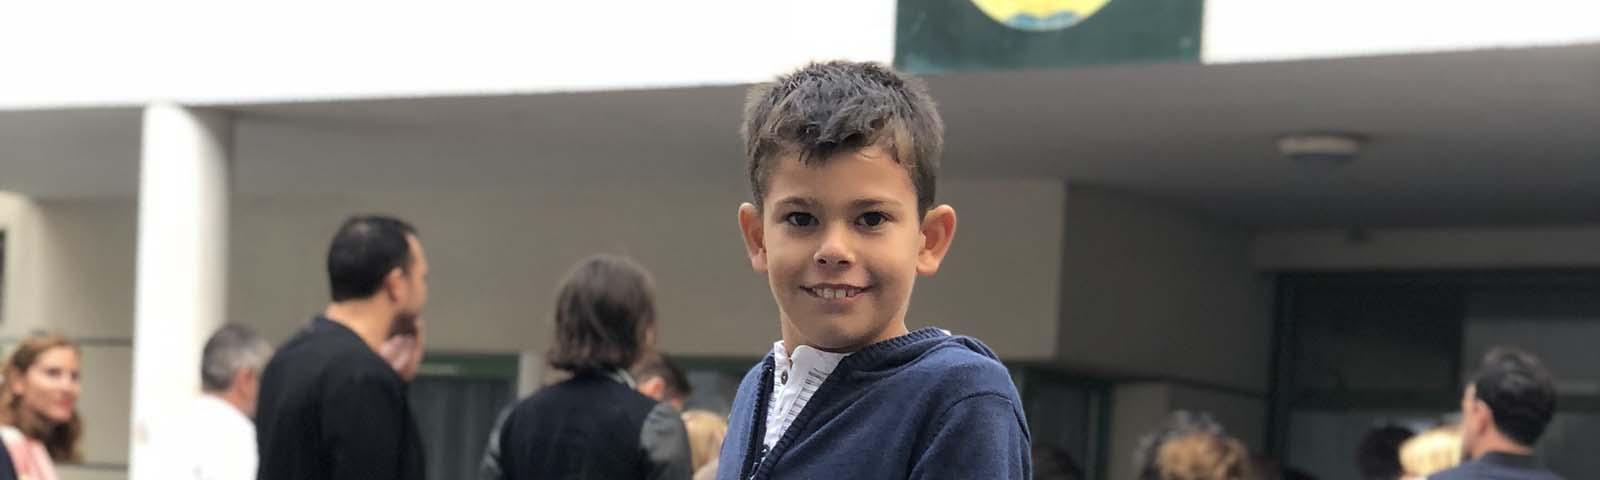 Aydan devant école